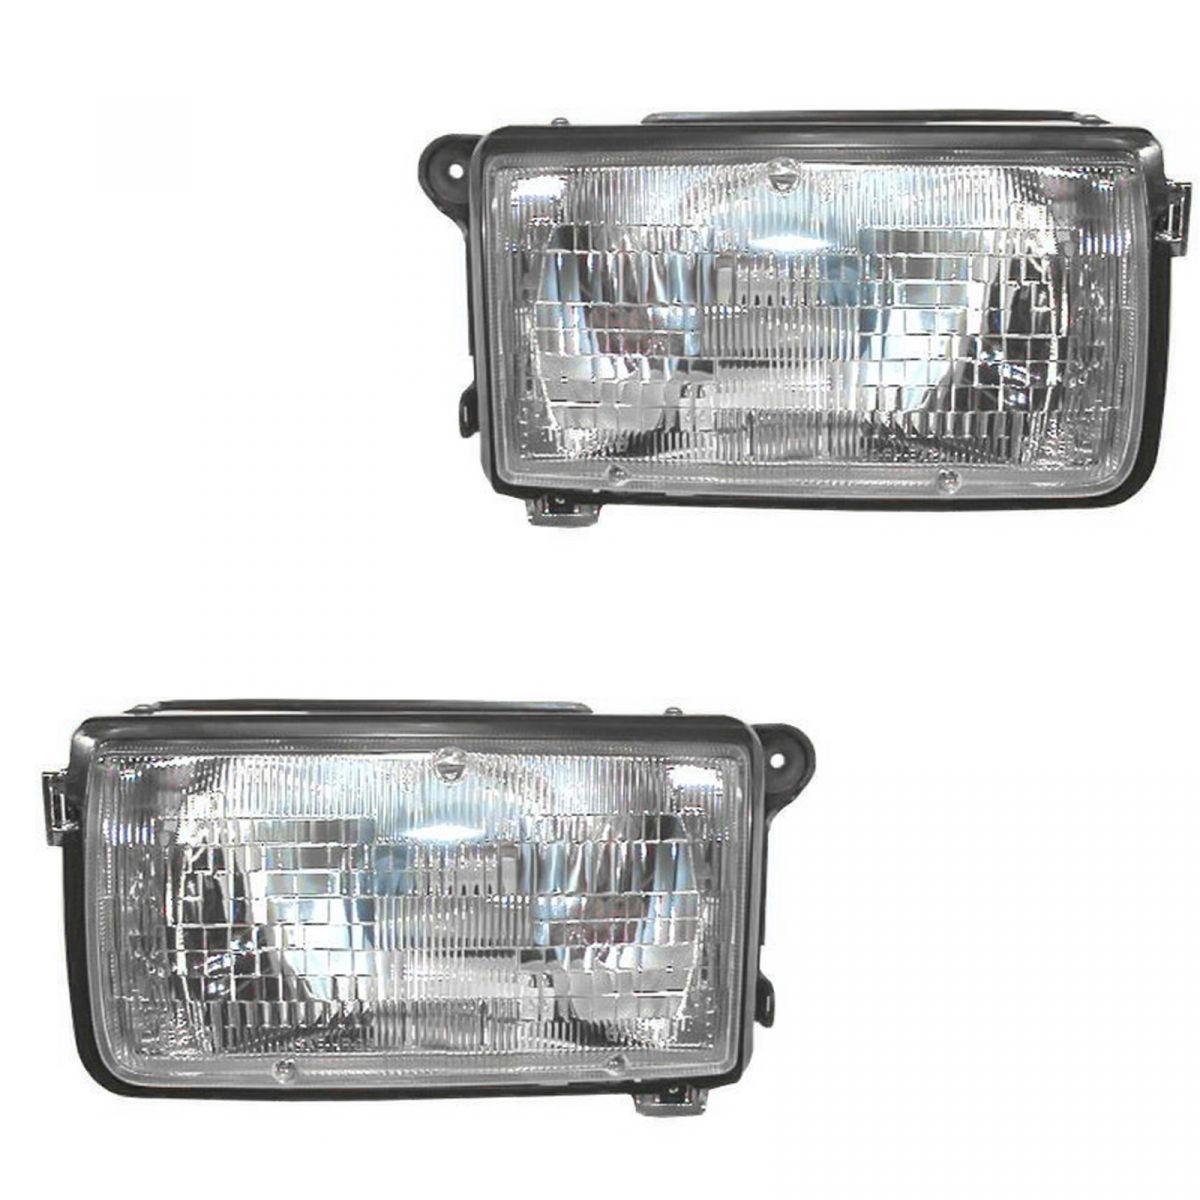 Headlight Headlamp Passenger Side Right RH for 98-99 Honda Passport Amigo Rodeo